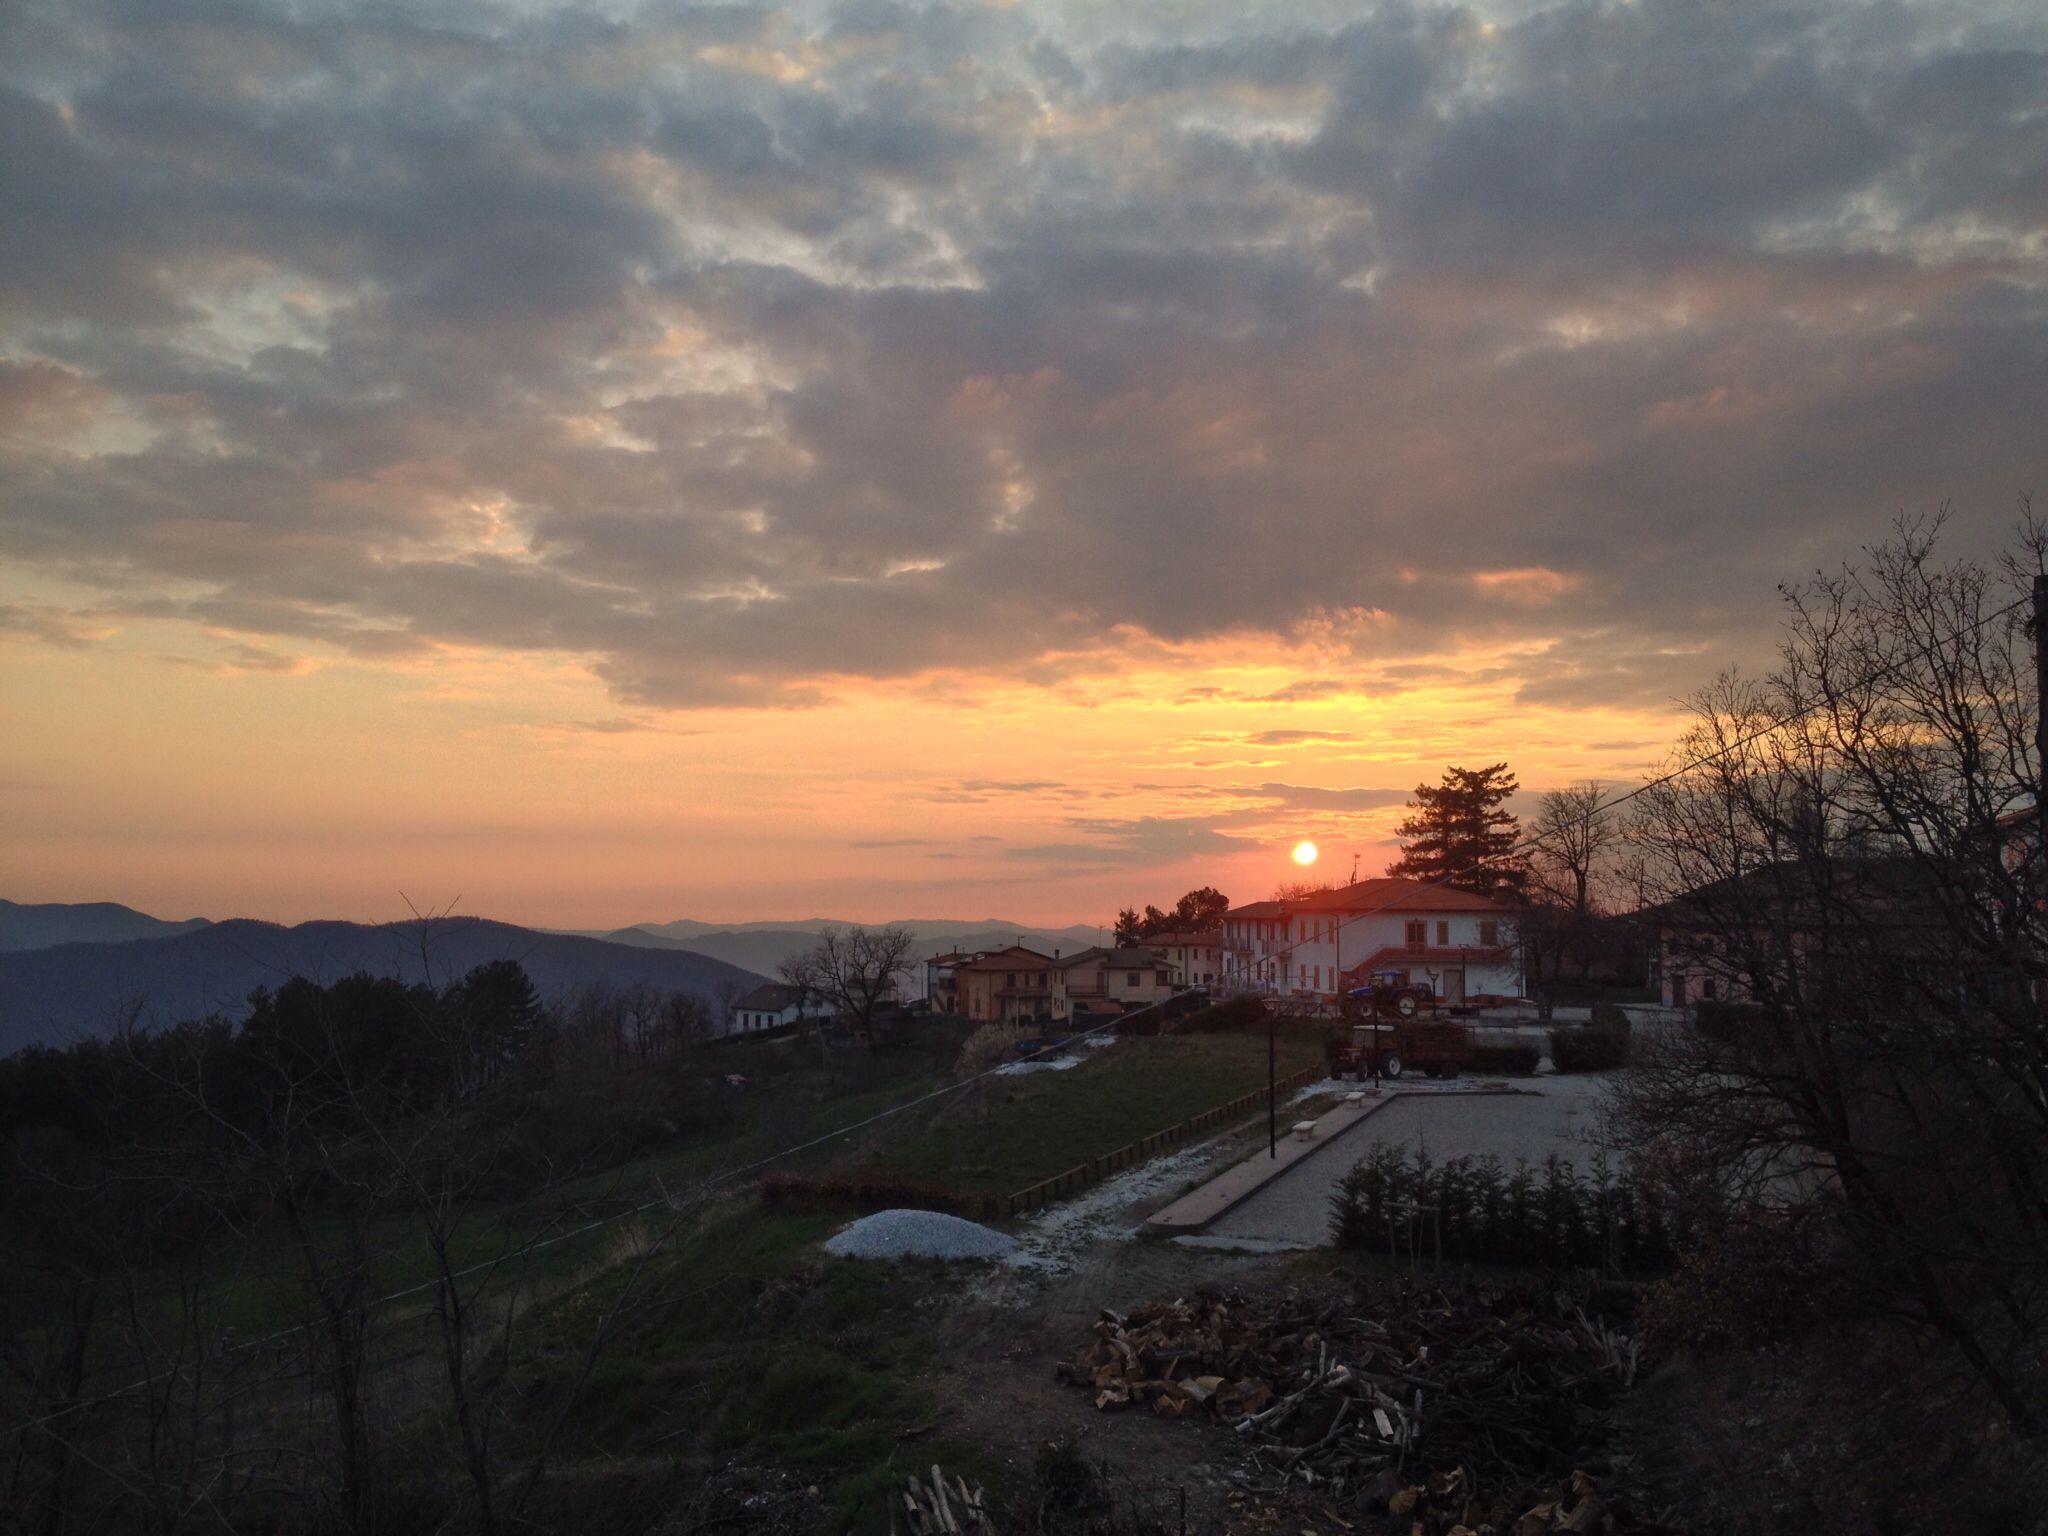 Tramonto in Garfagnana.